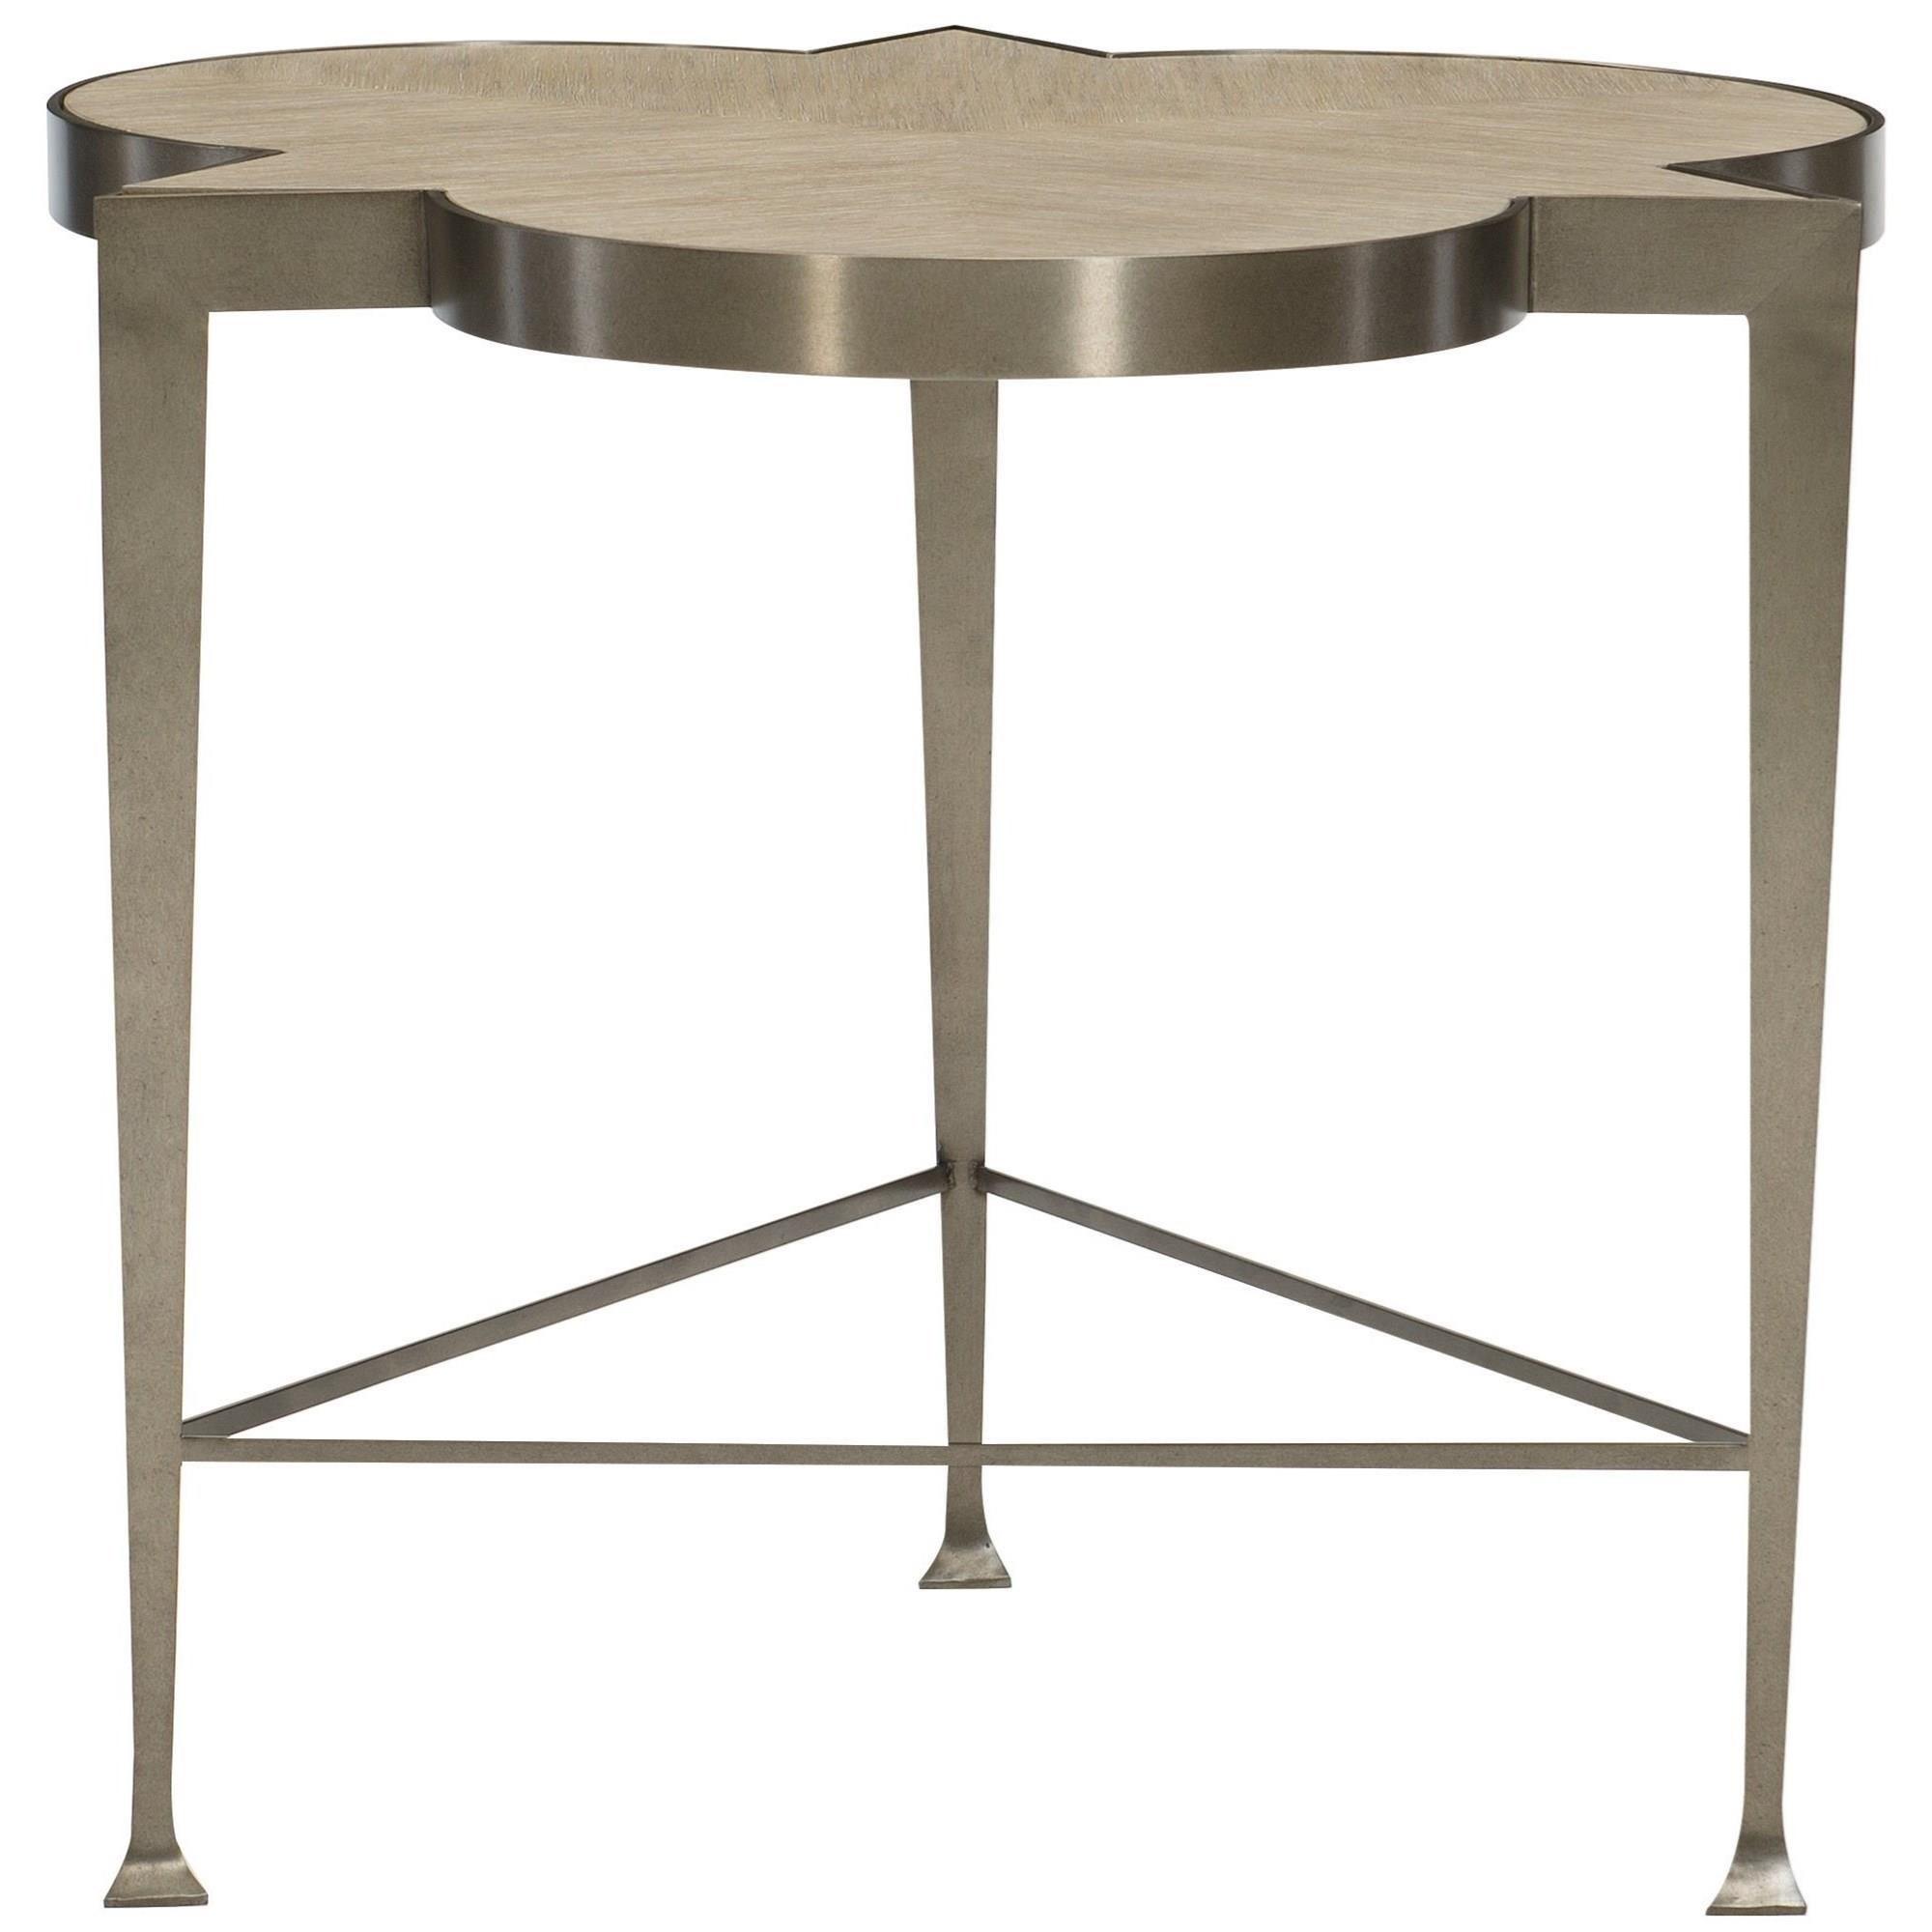 Santa Barbara Chairside Table by Bernhardt at Baer's Furniture